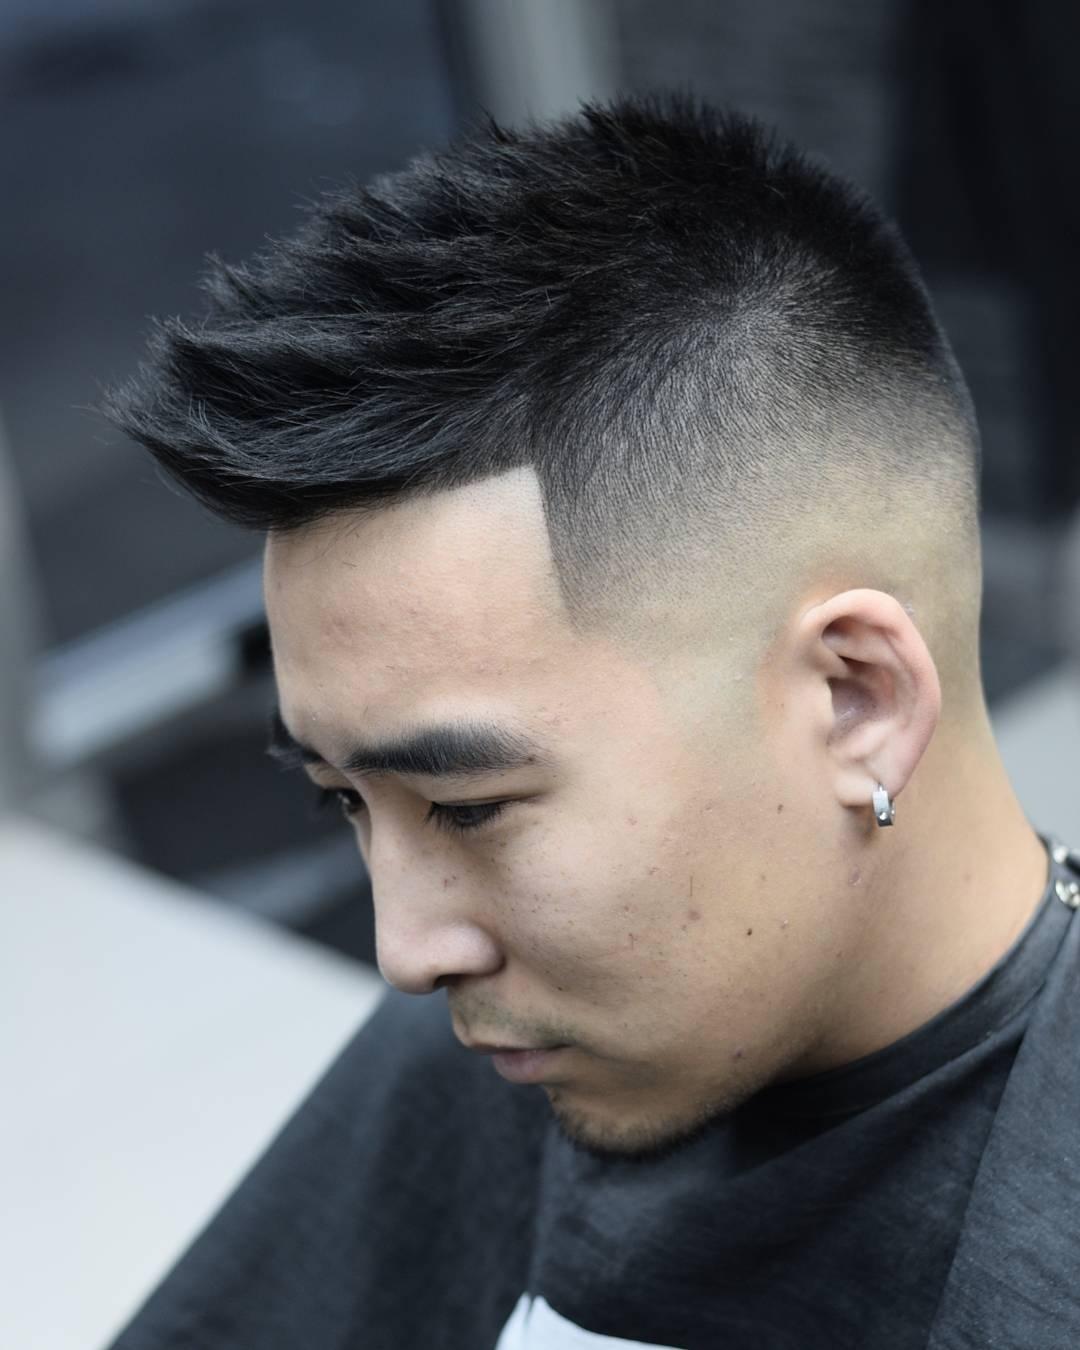 Best Hairstyles For Asian Men regarding Asian Boy Hairstyles 2018